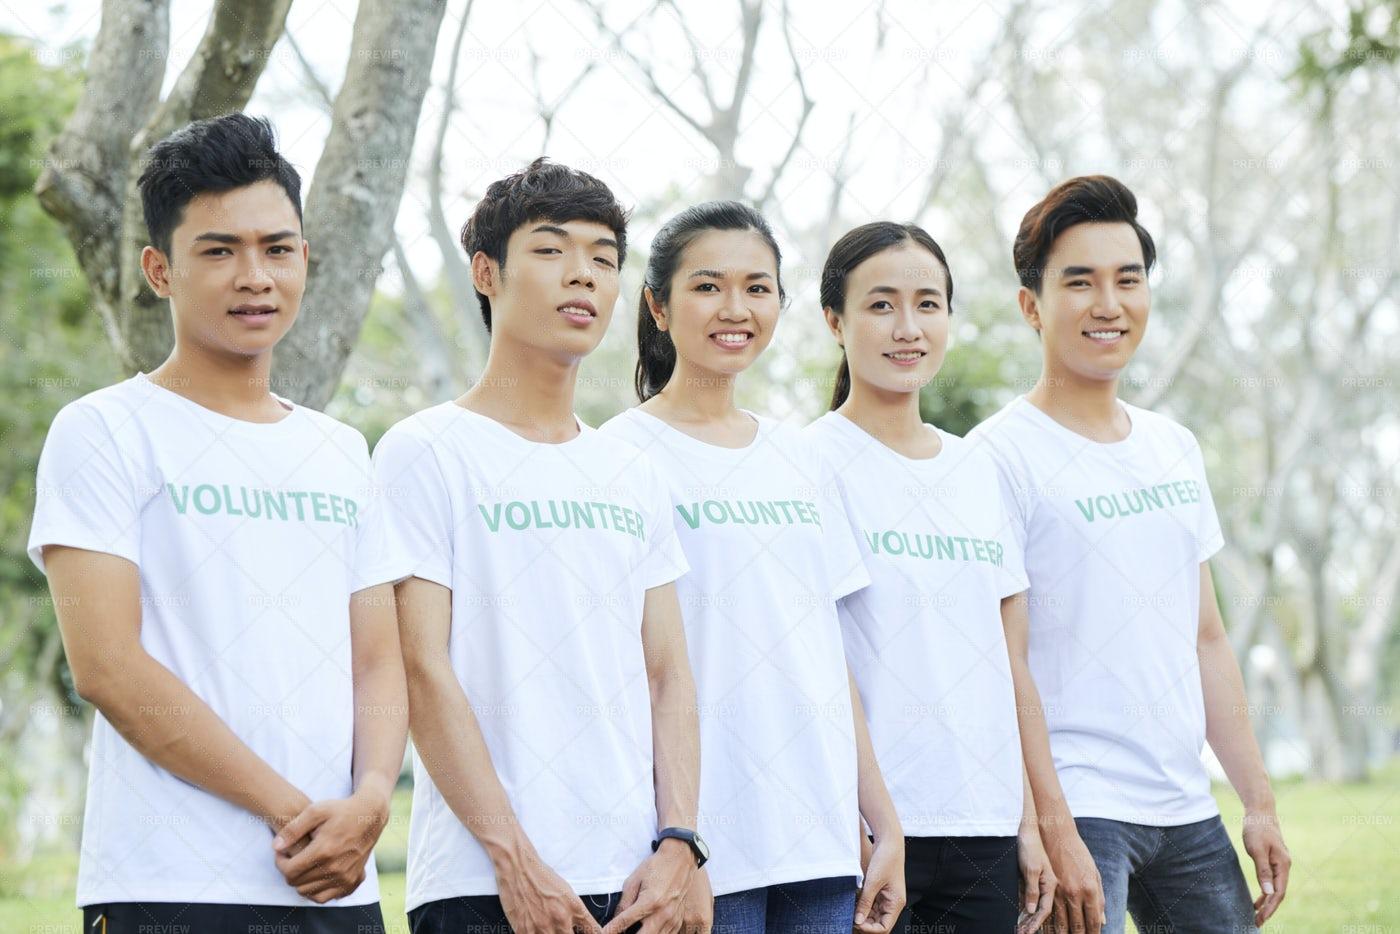 Volunteer Group Standing Outdoors: Stock Photos